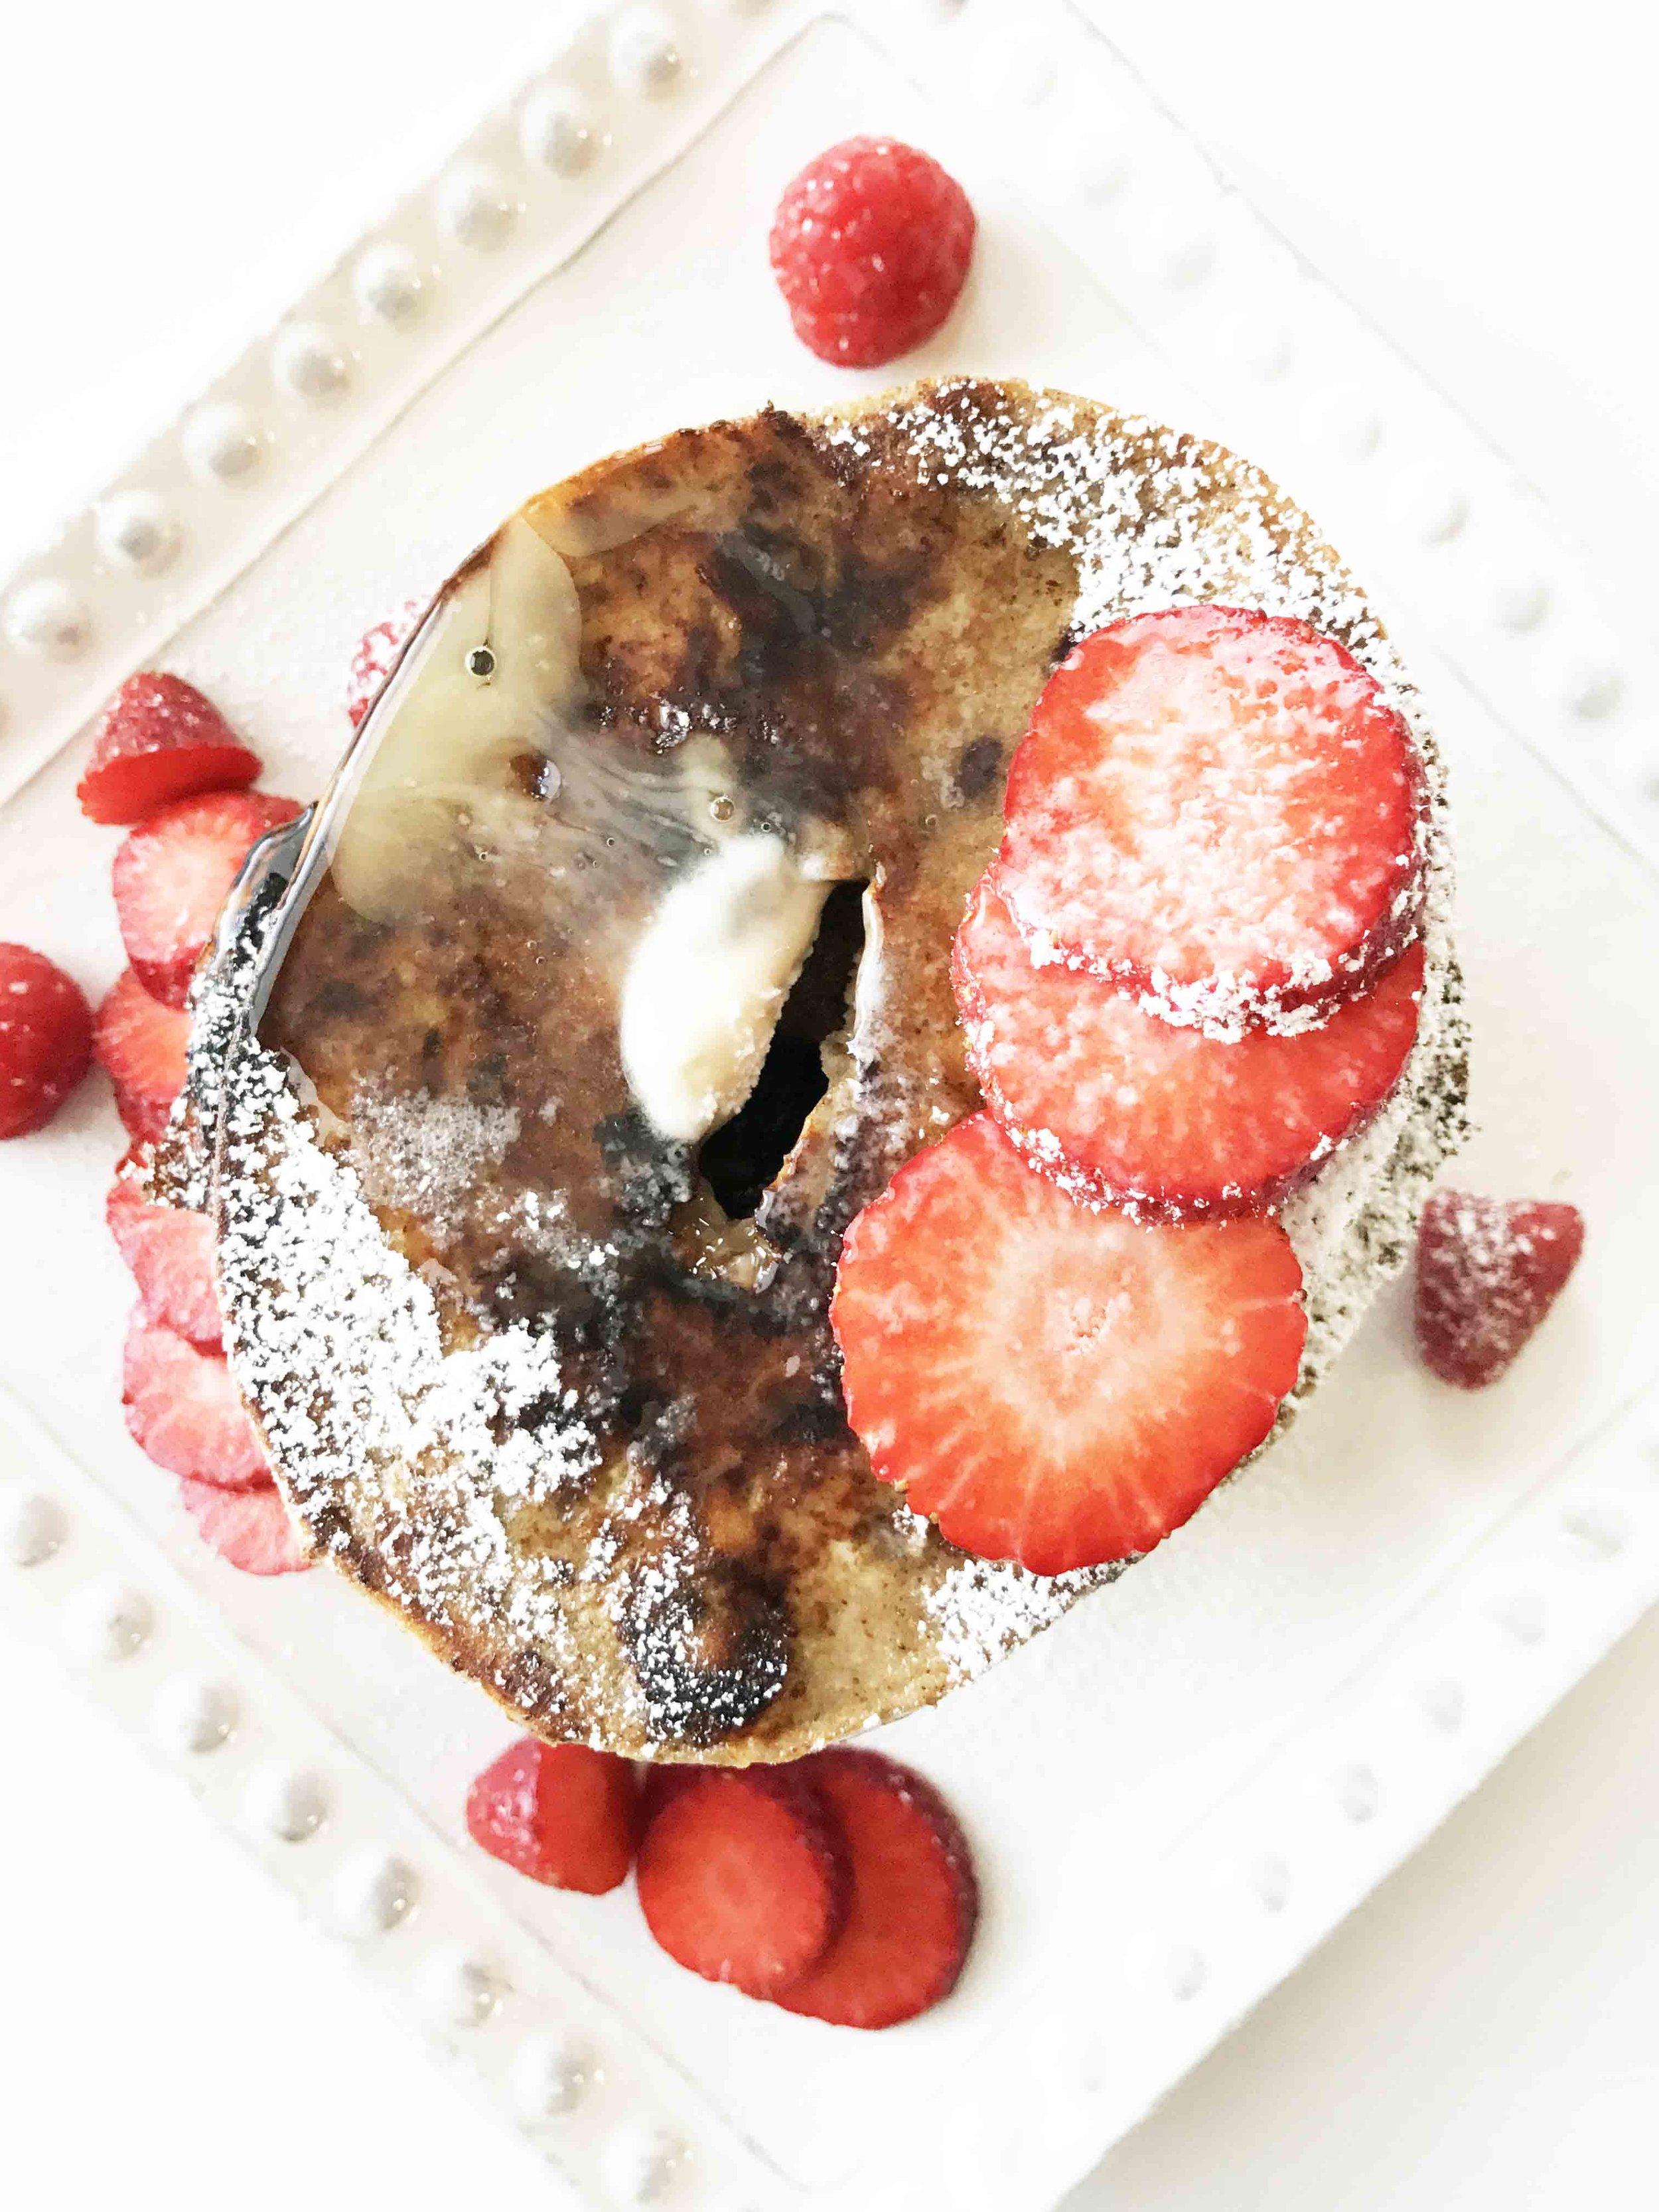 blueberry-bagel-french-toast8.jpg